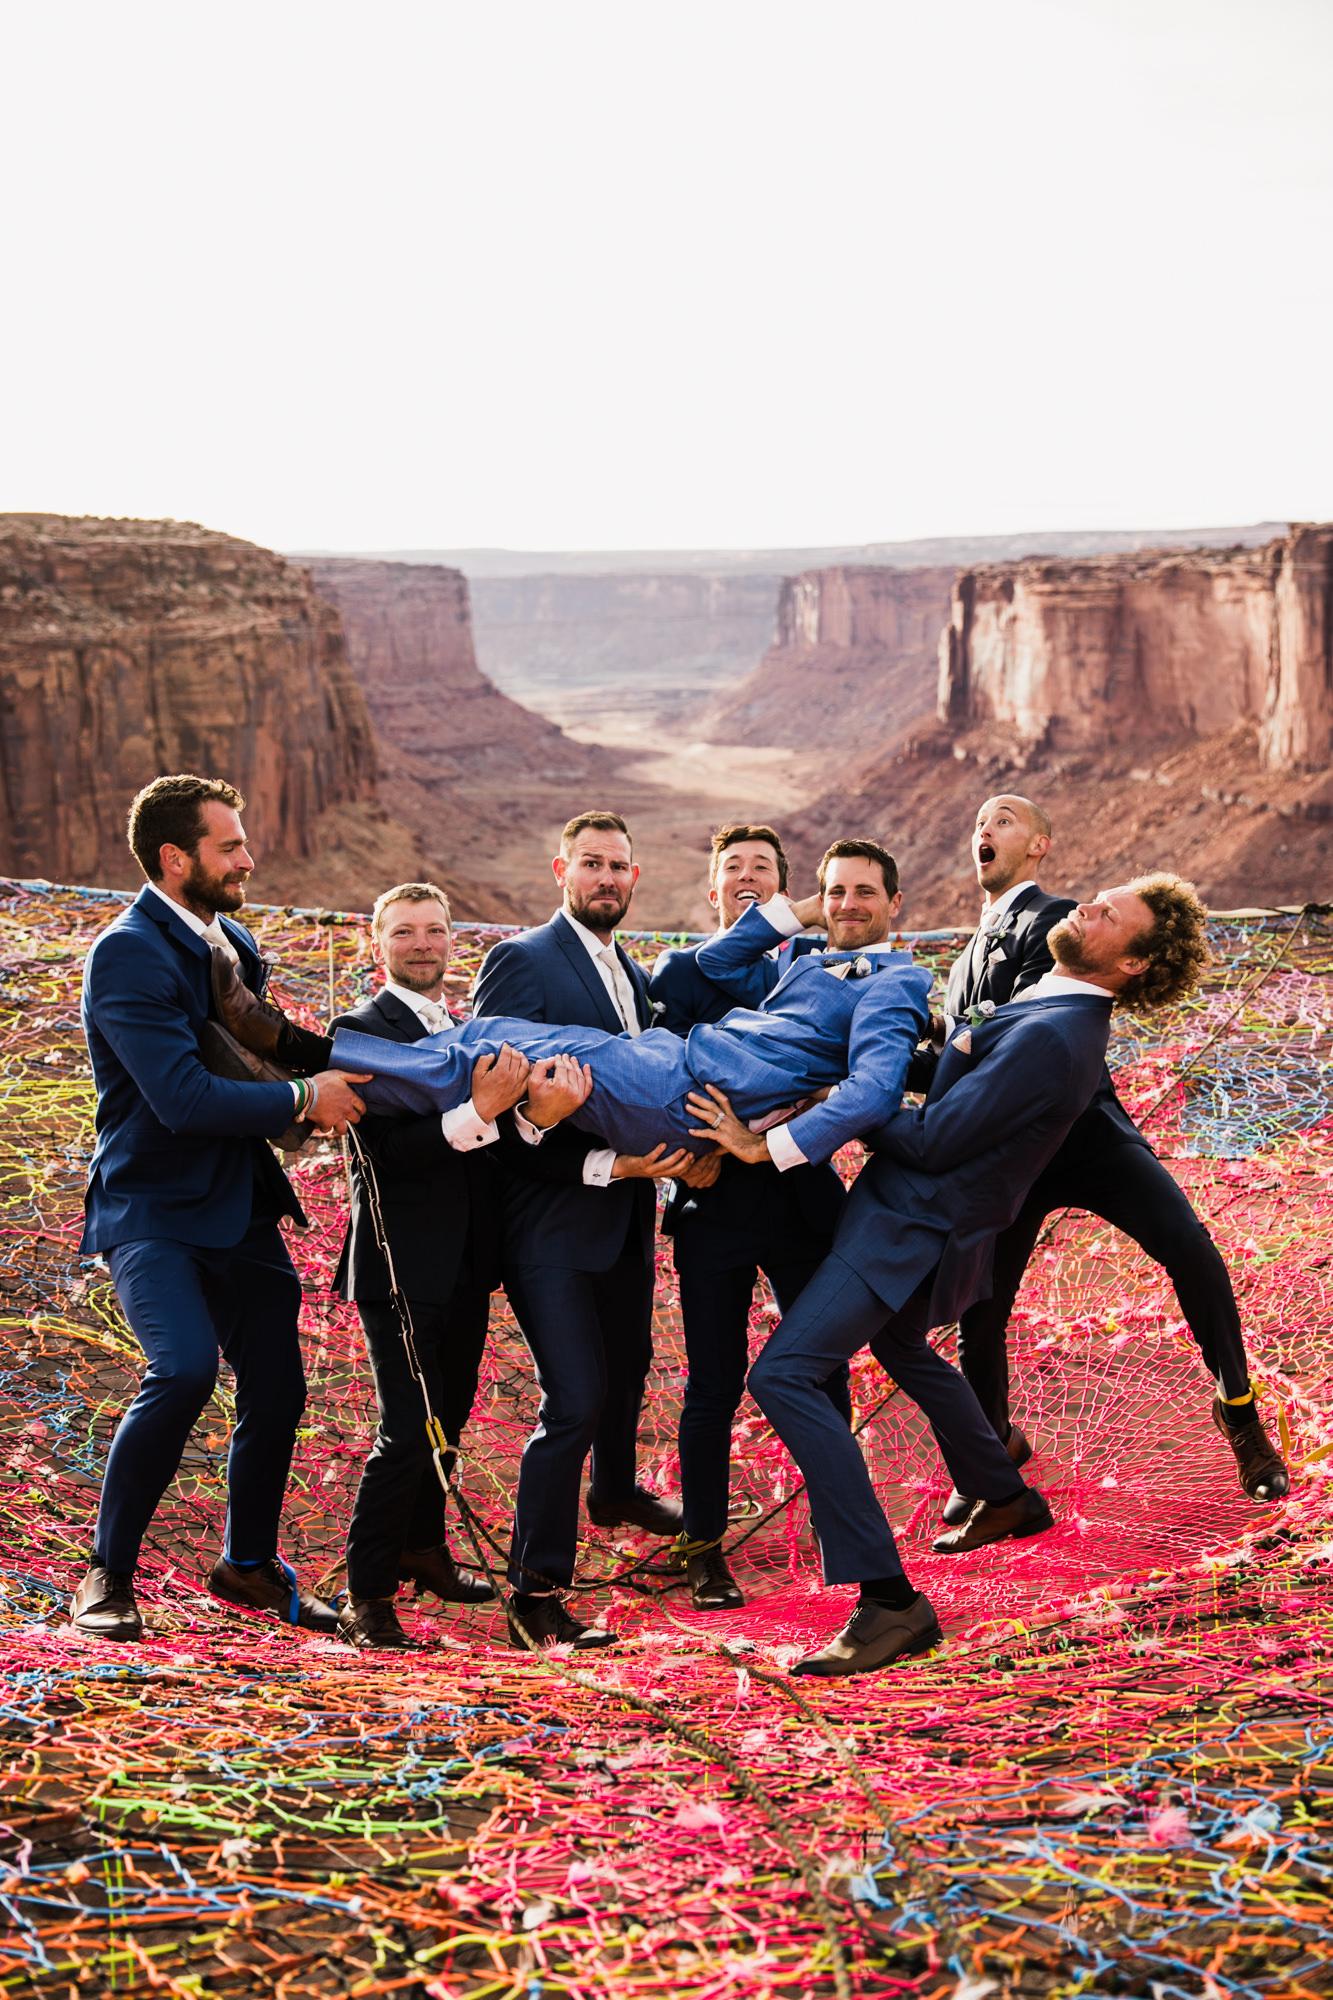 moab, utah spacenet wedding | destination adventure wedding photographers | the hearnes adventure photography | www.thehearnes.com